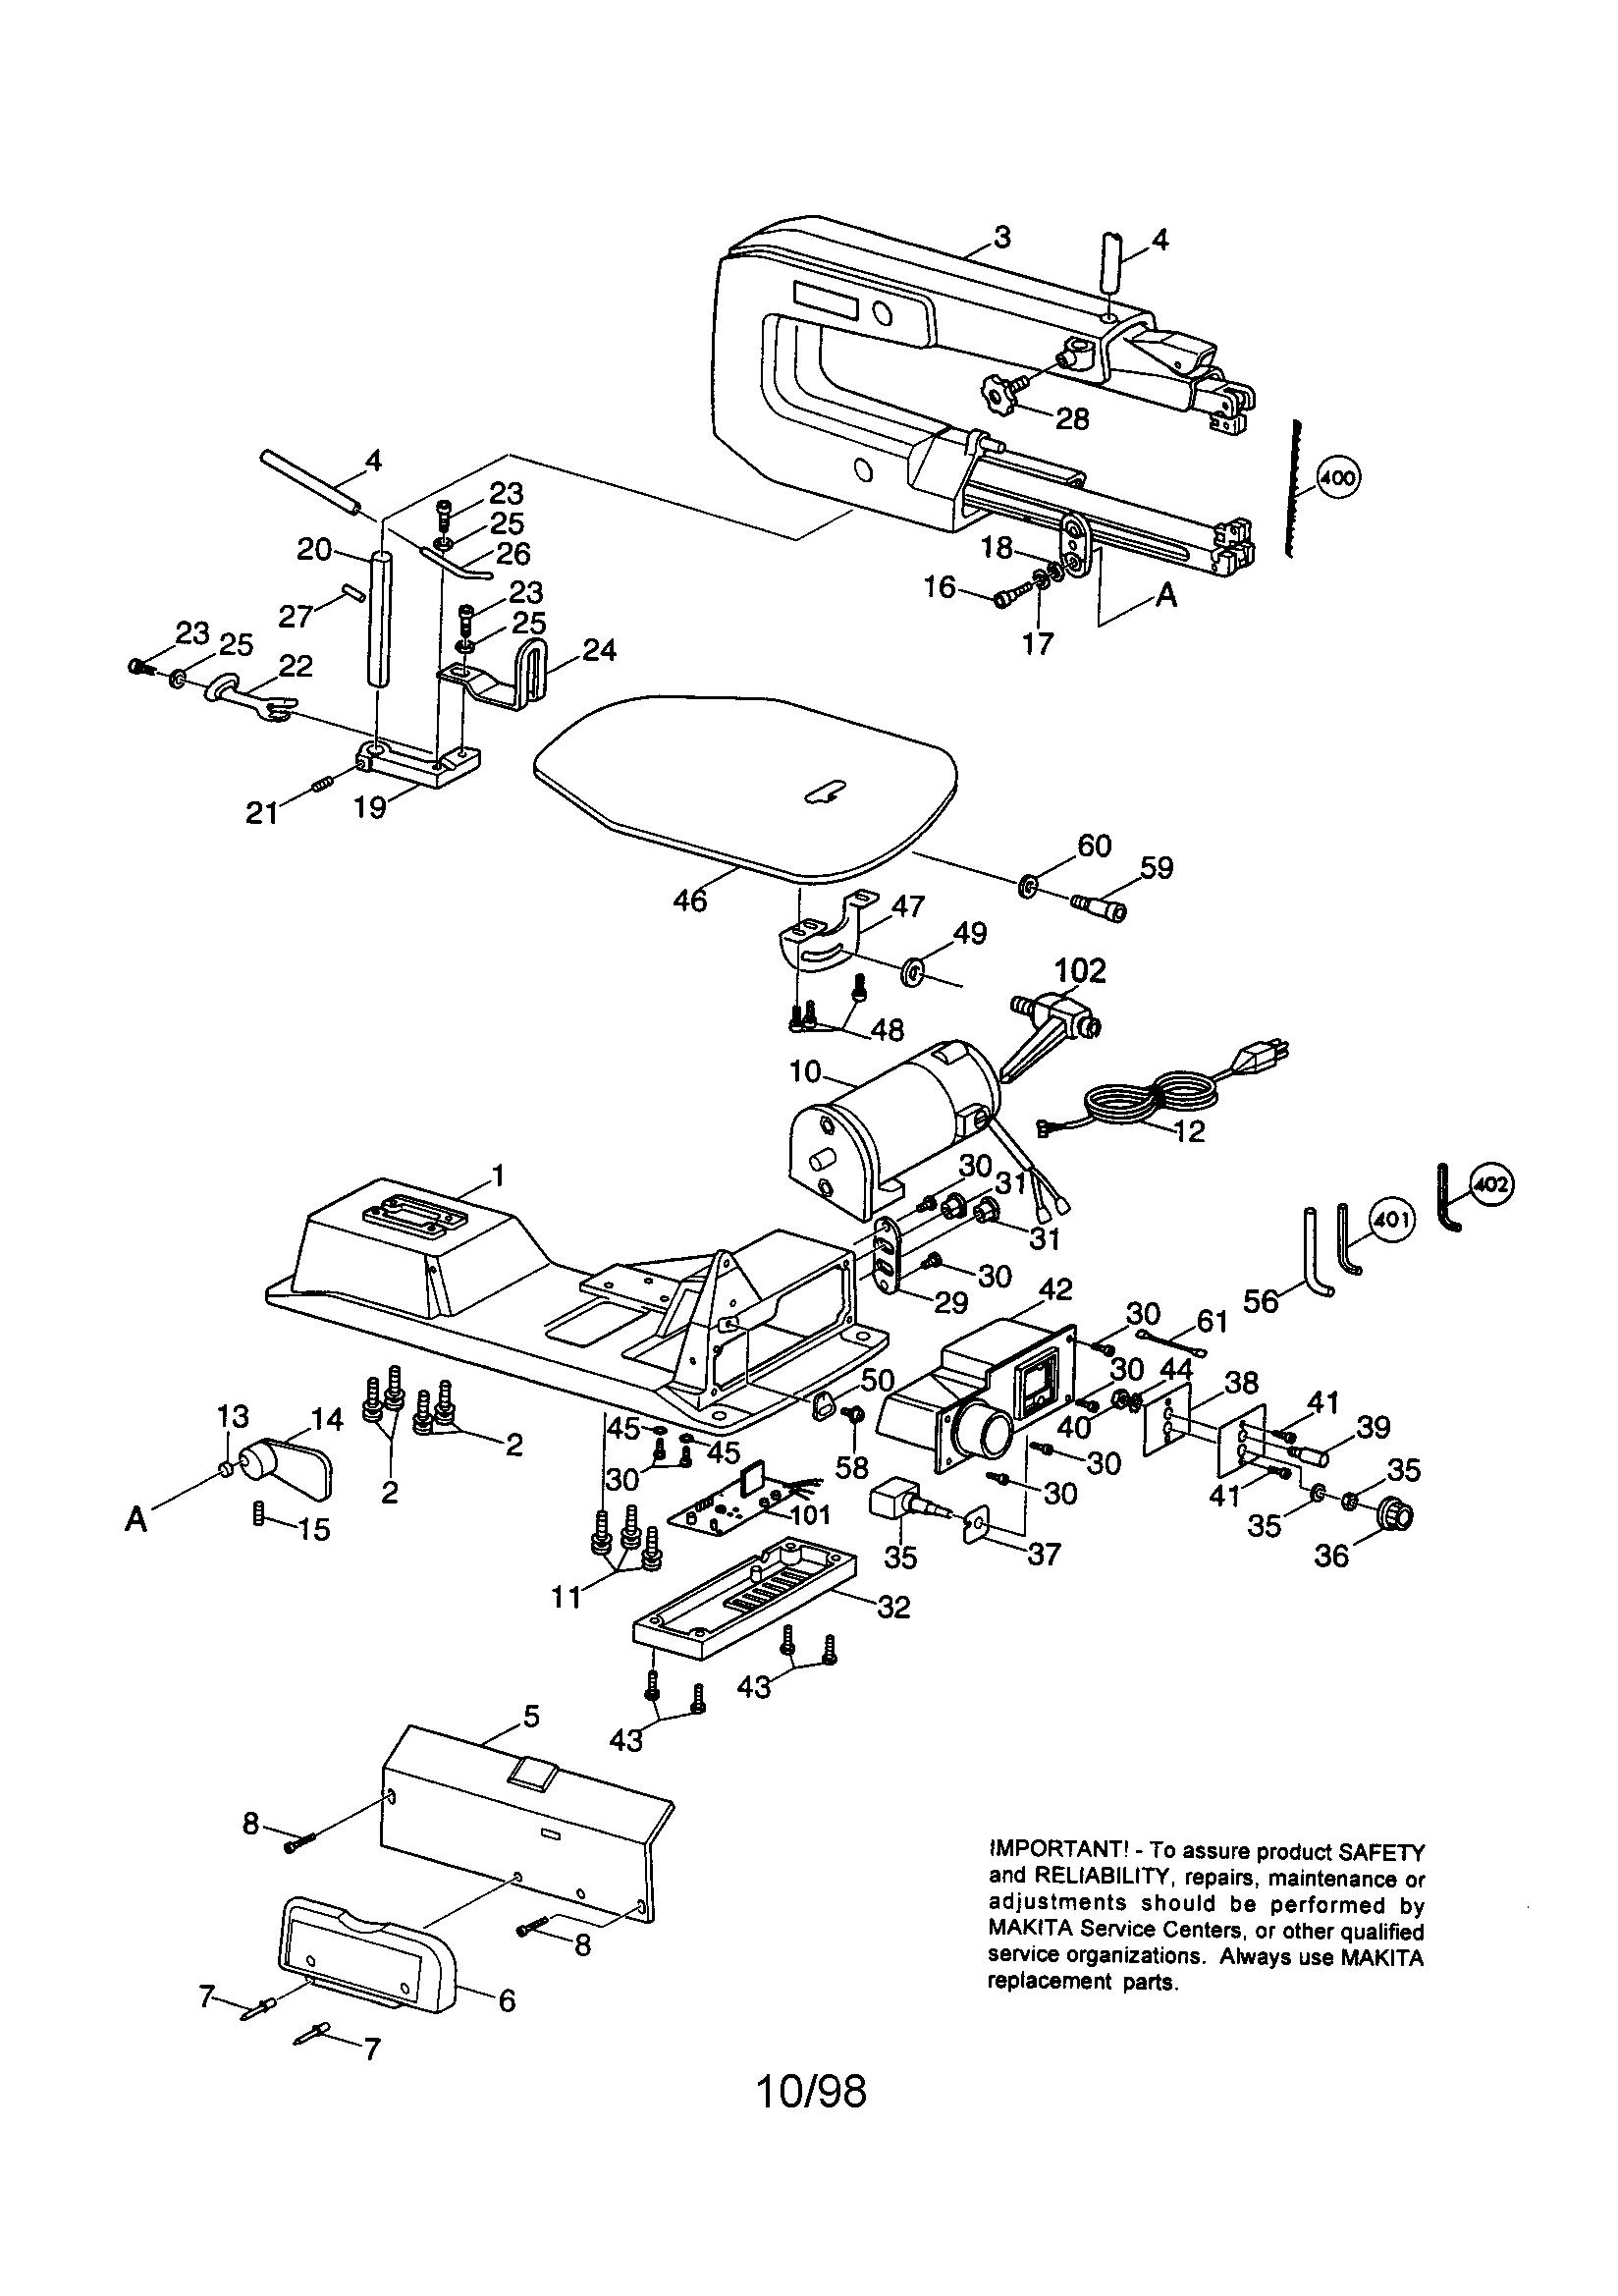 Makita model SJ401 saw scroll genuine parts